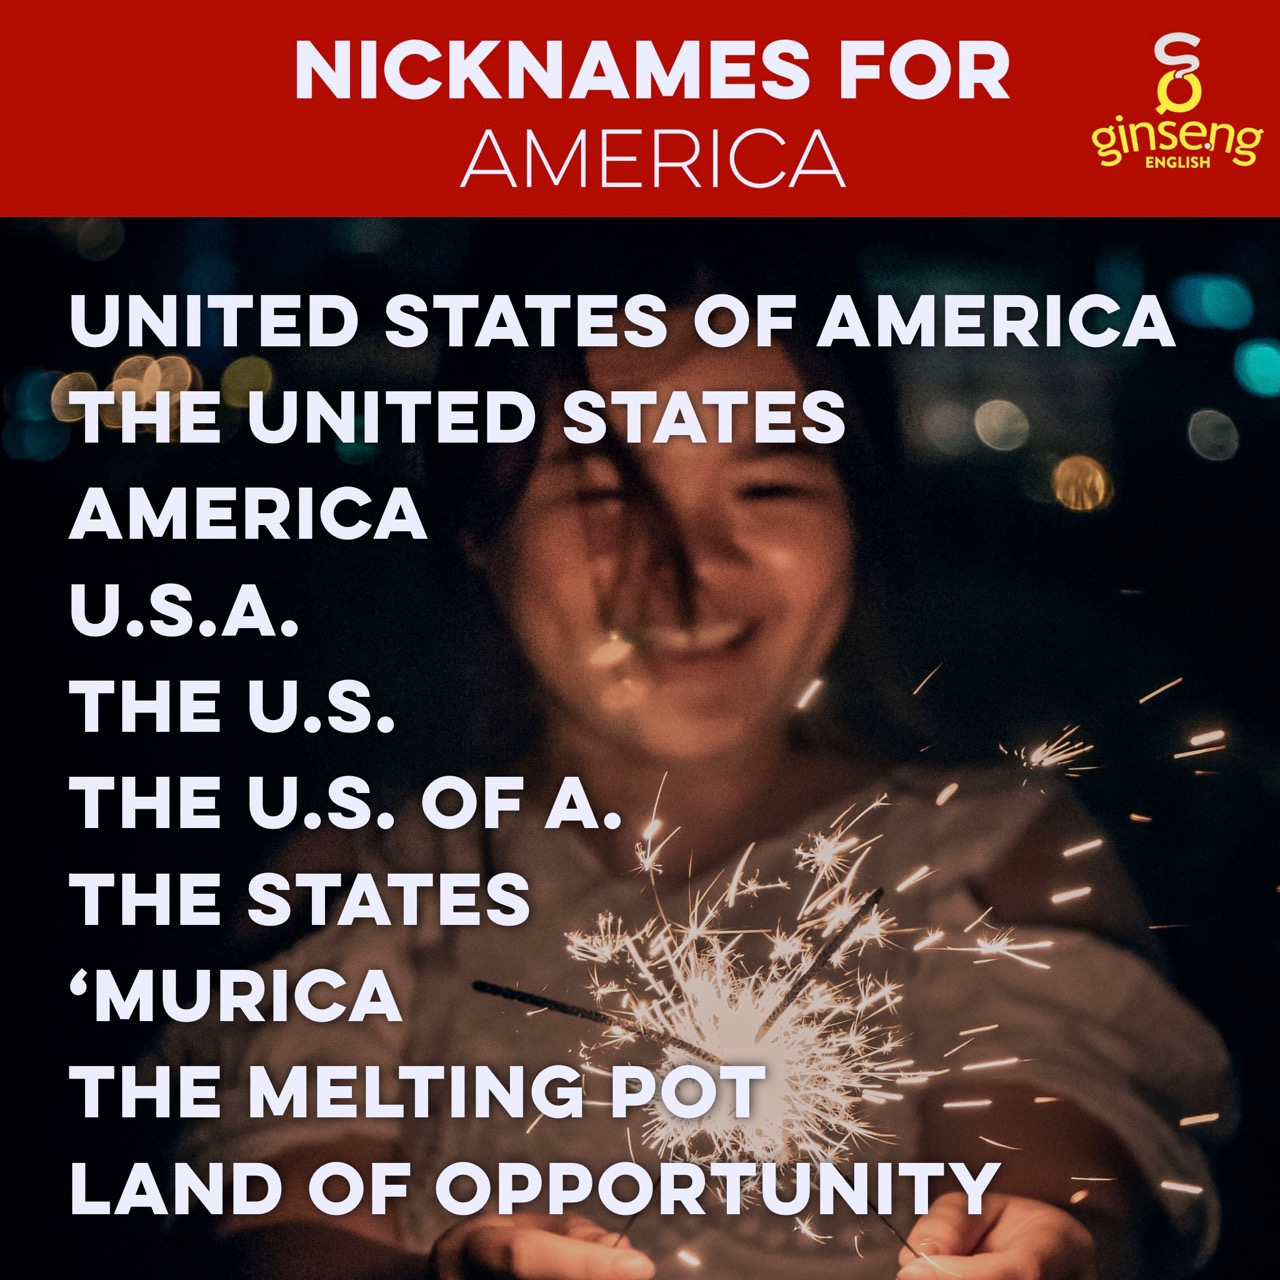 Nicknames for America